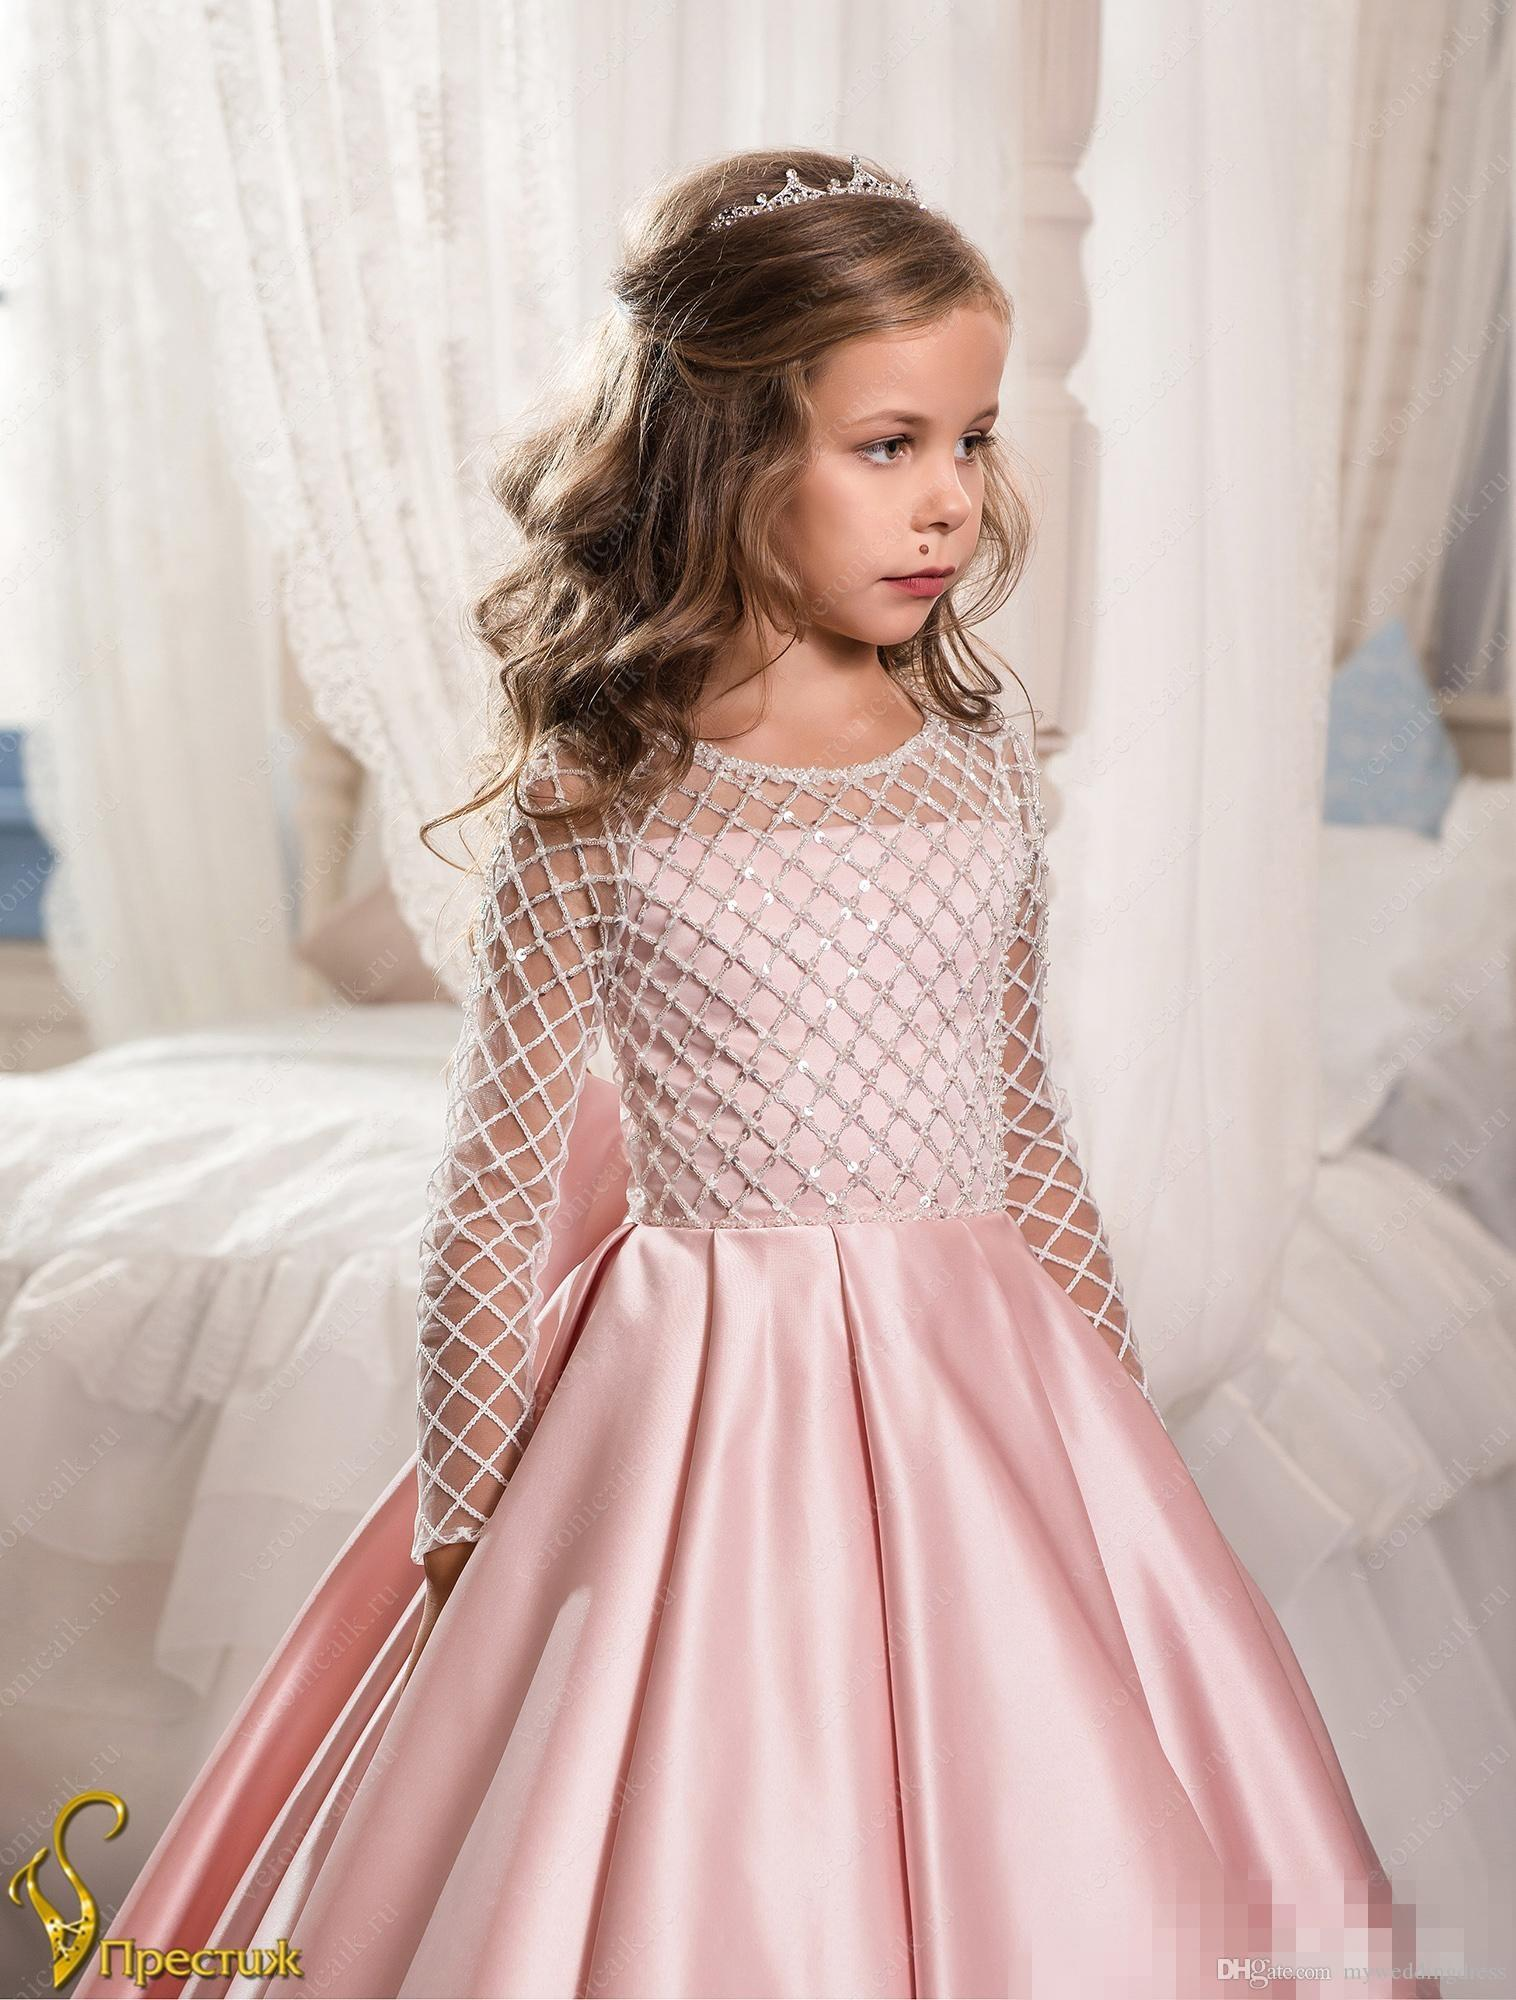 Peach Flower Girl Dresses With Long Sleeves Tutu For Girls 2017 Cute ...